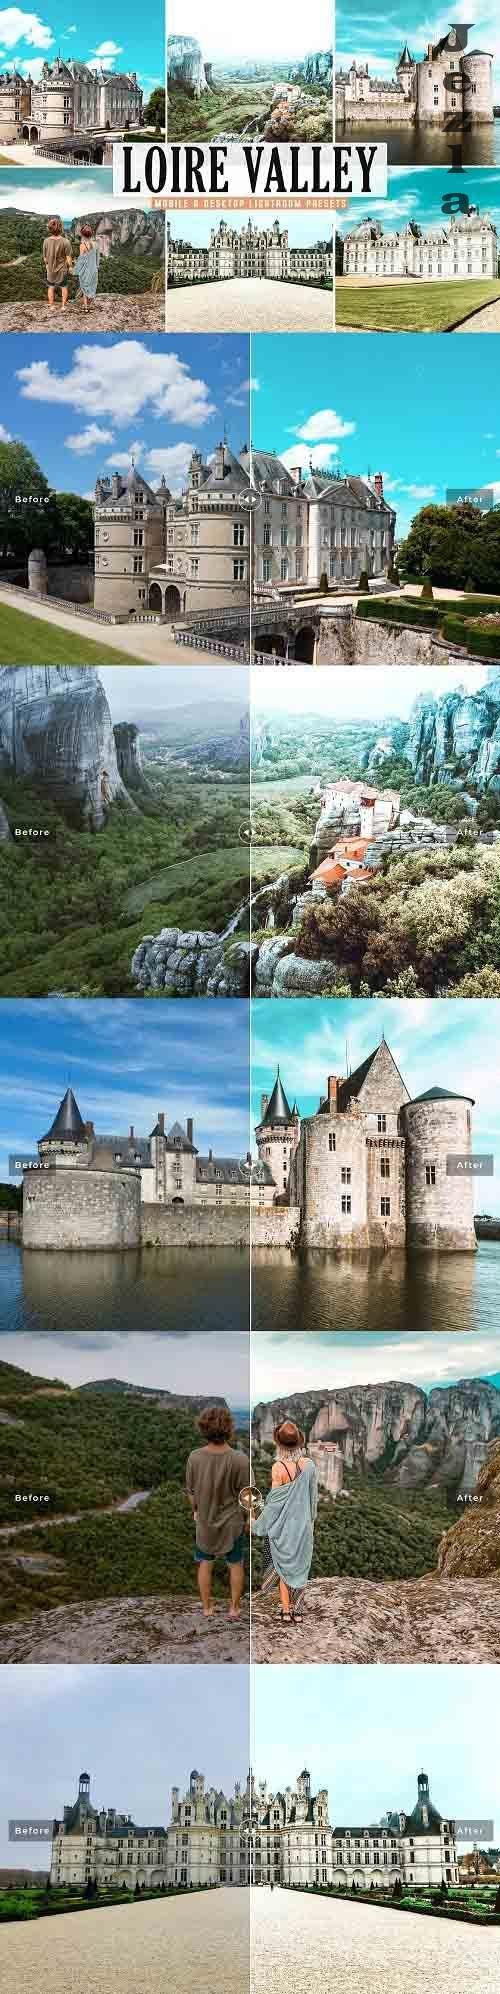 Loire Valley Pro Lightroom Presets - 5653989 - Mobile & Desktop